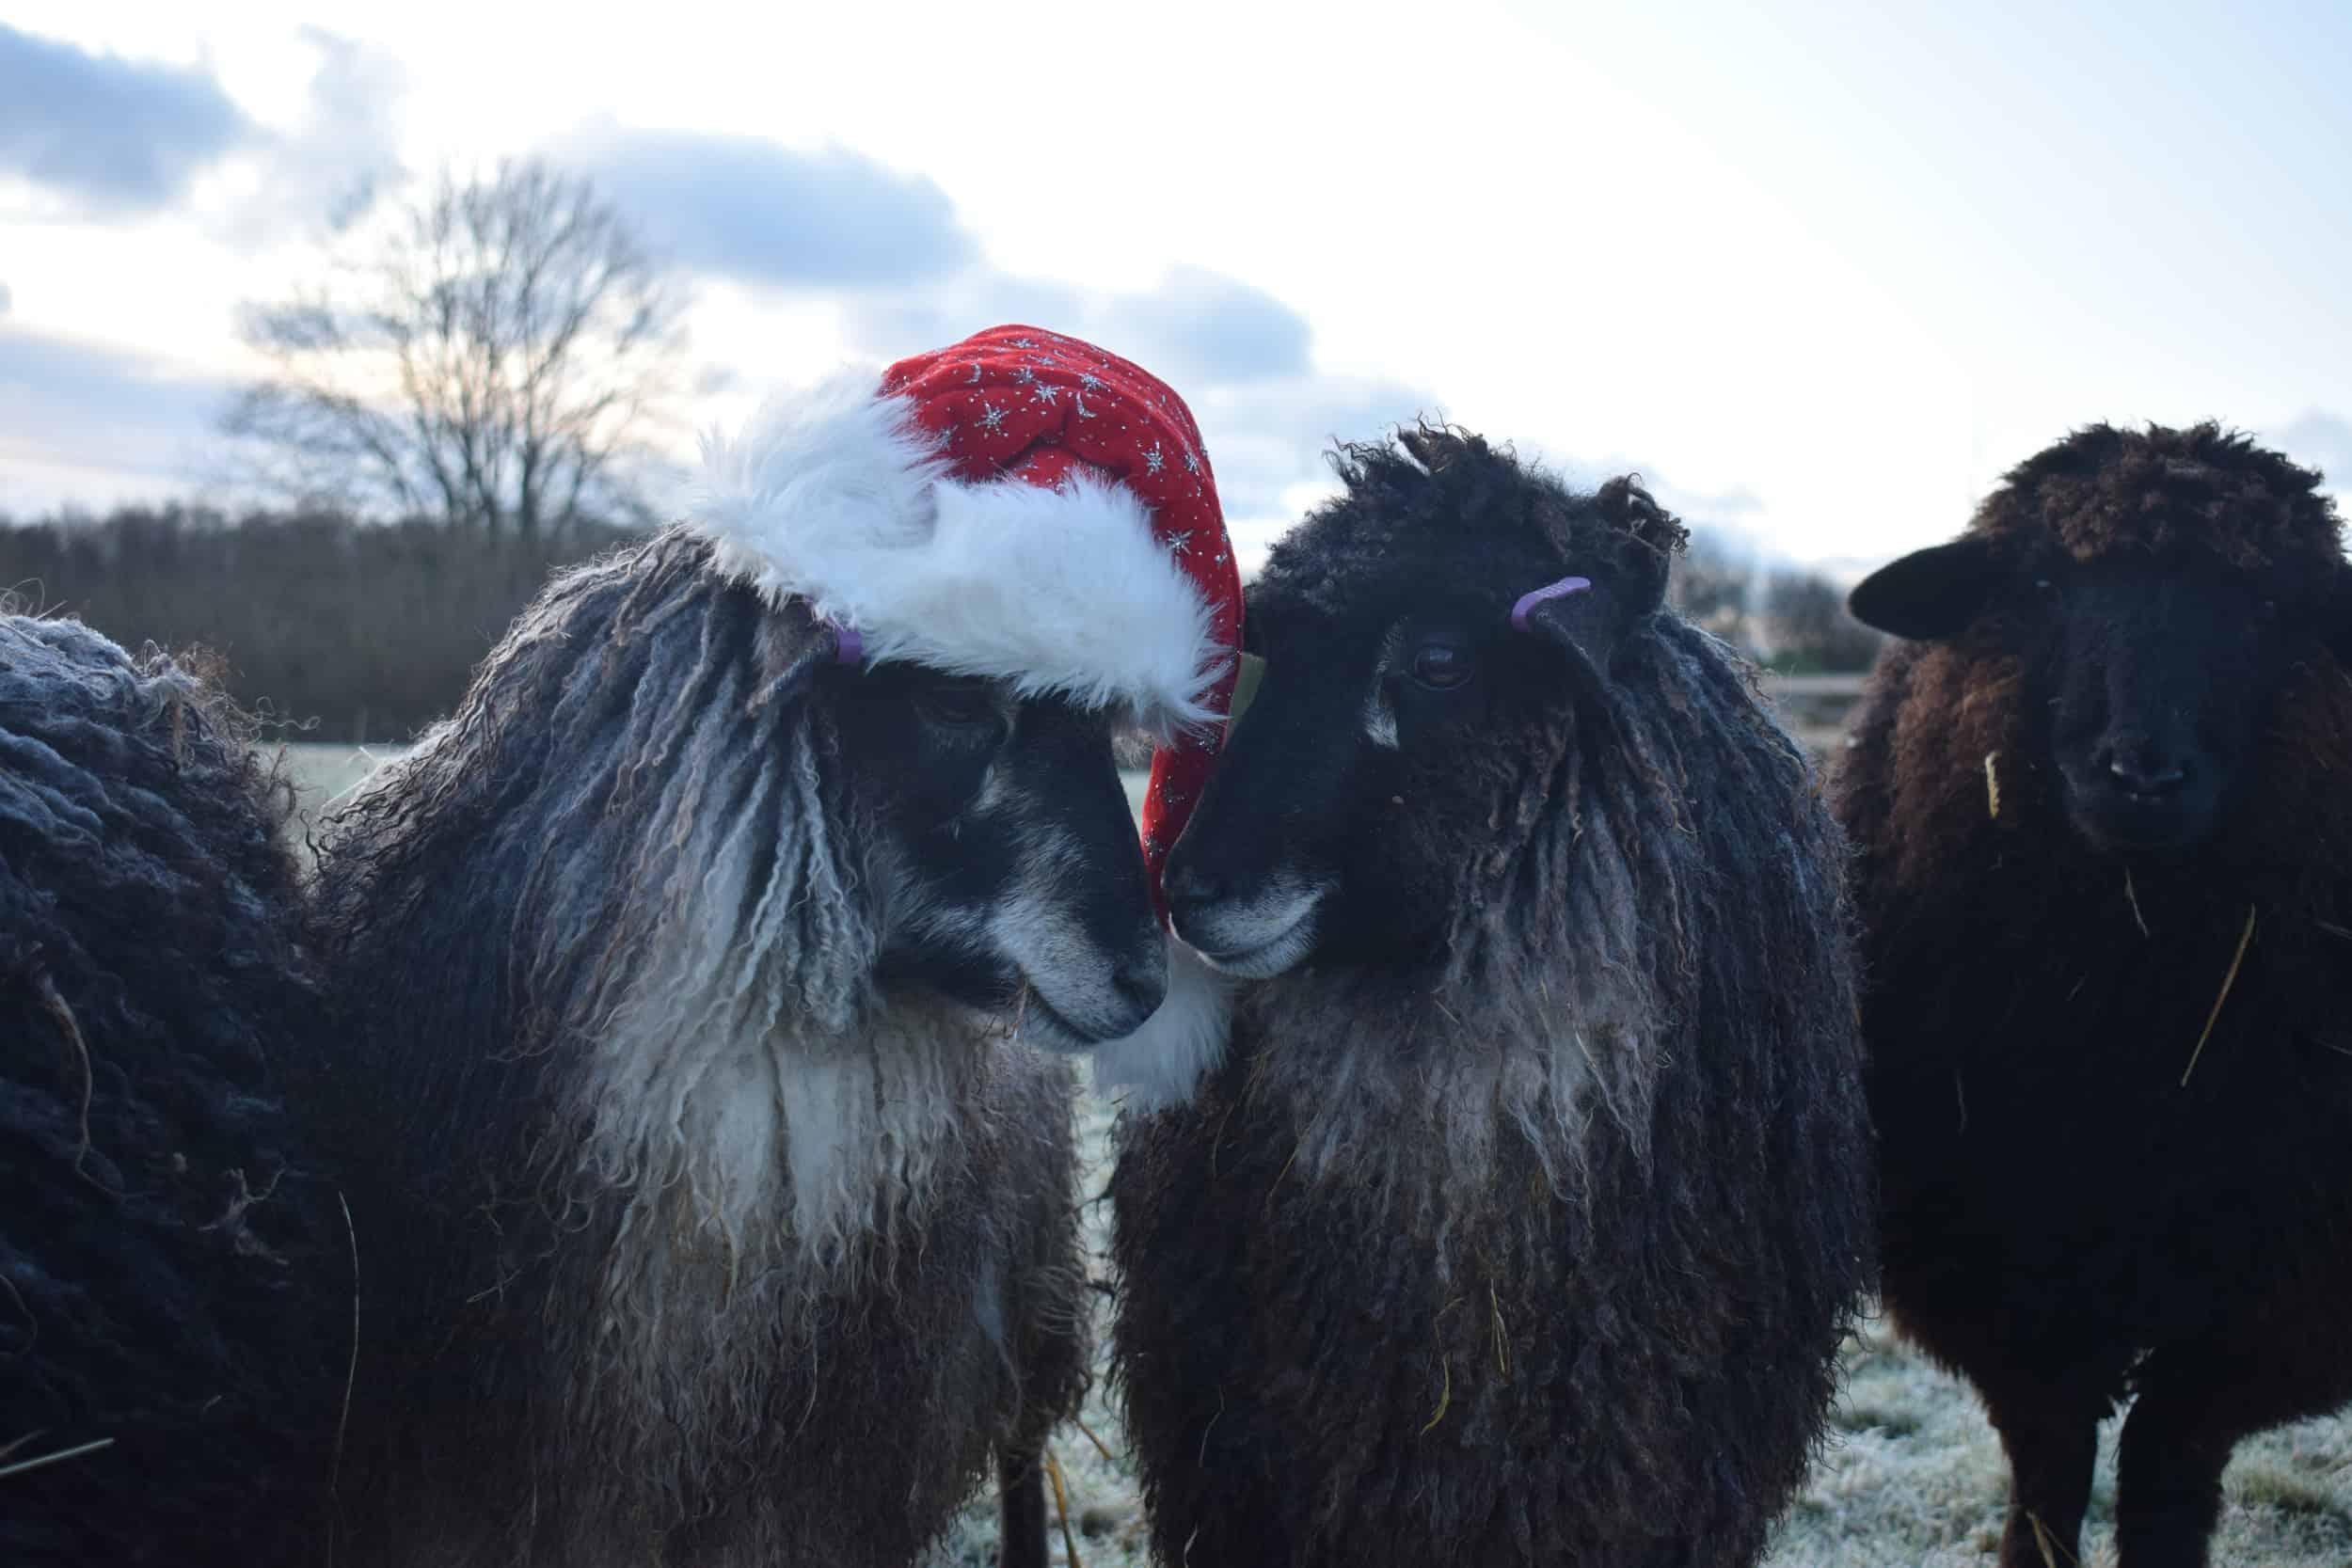 florence jemima christmas sheep xmas santa hat coloured leicester longwool gotland shetland sheep crossbreed english blue kind fibre